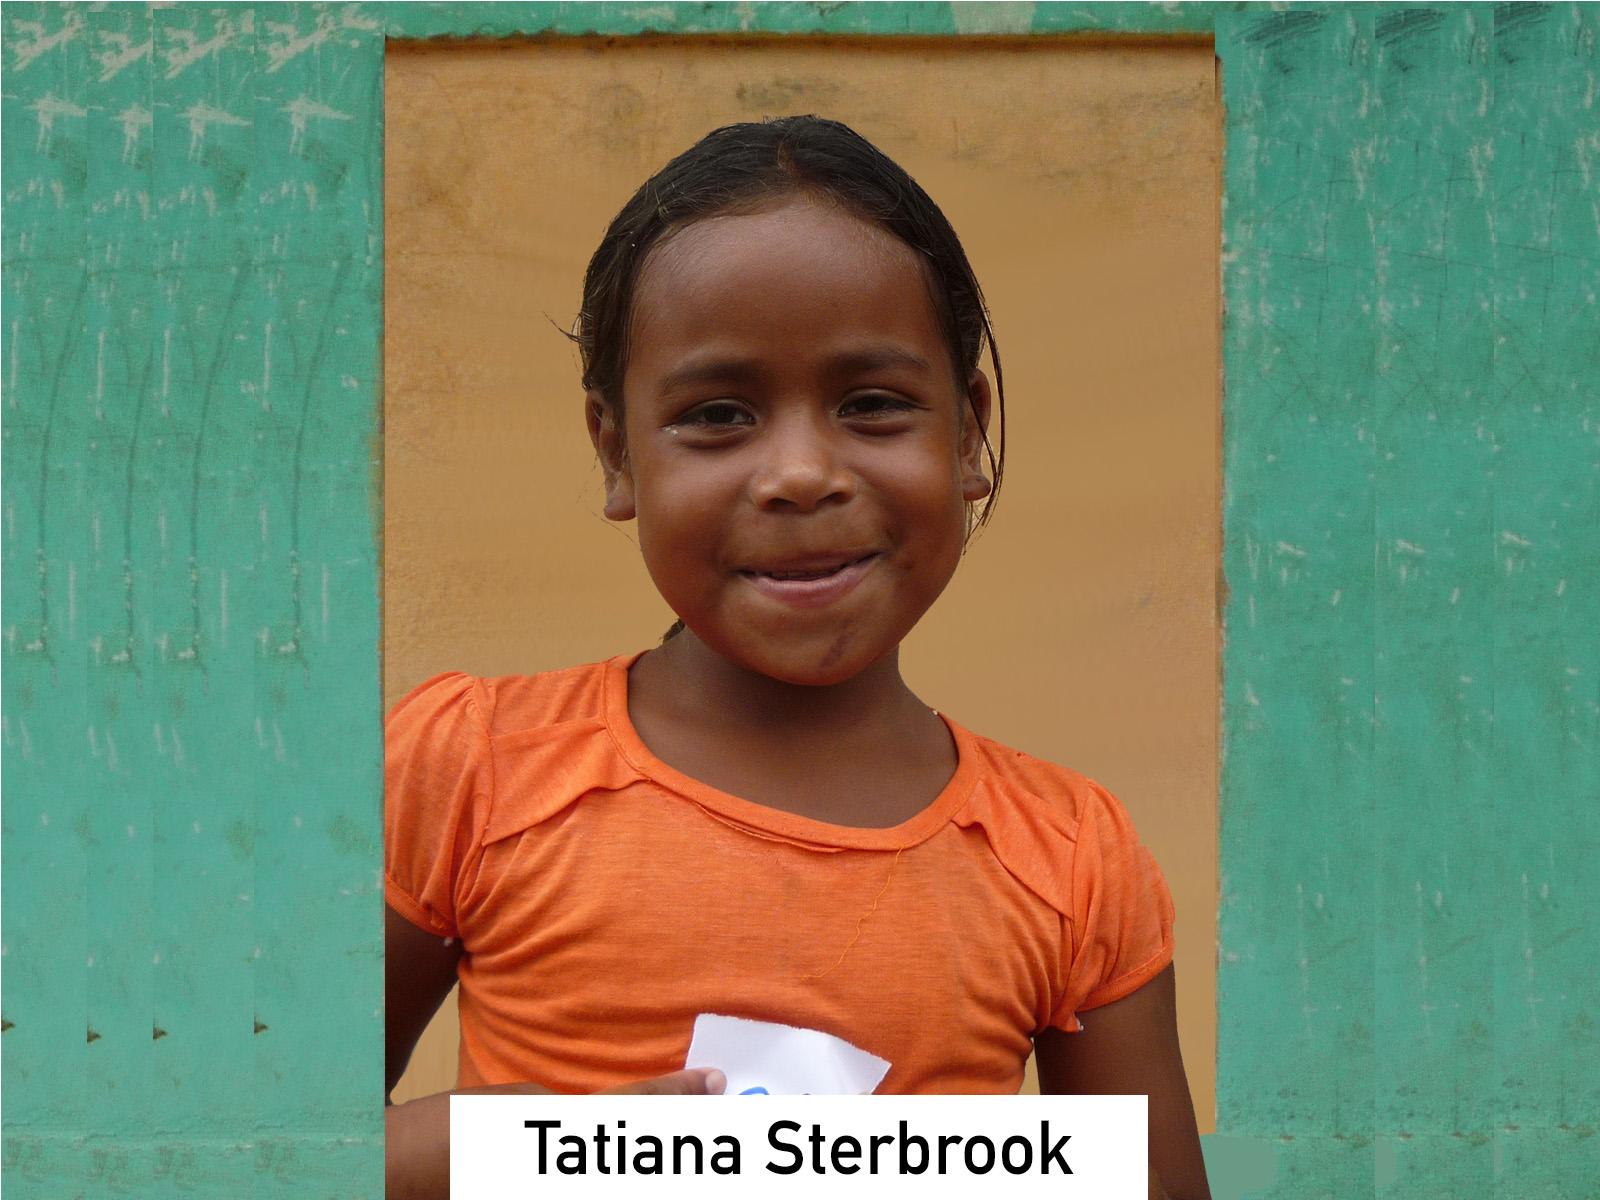 026 - Tatiana Sterbrook.jpg